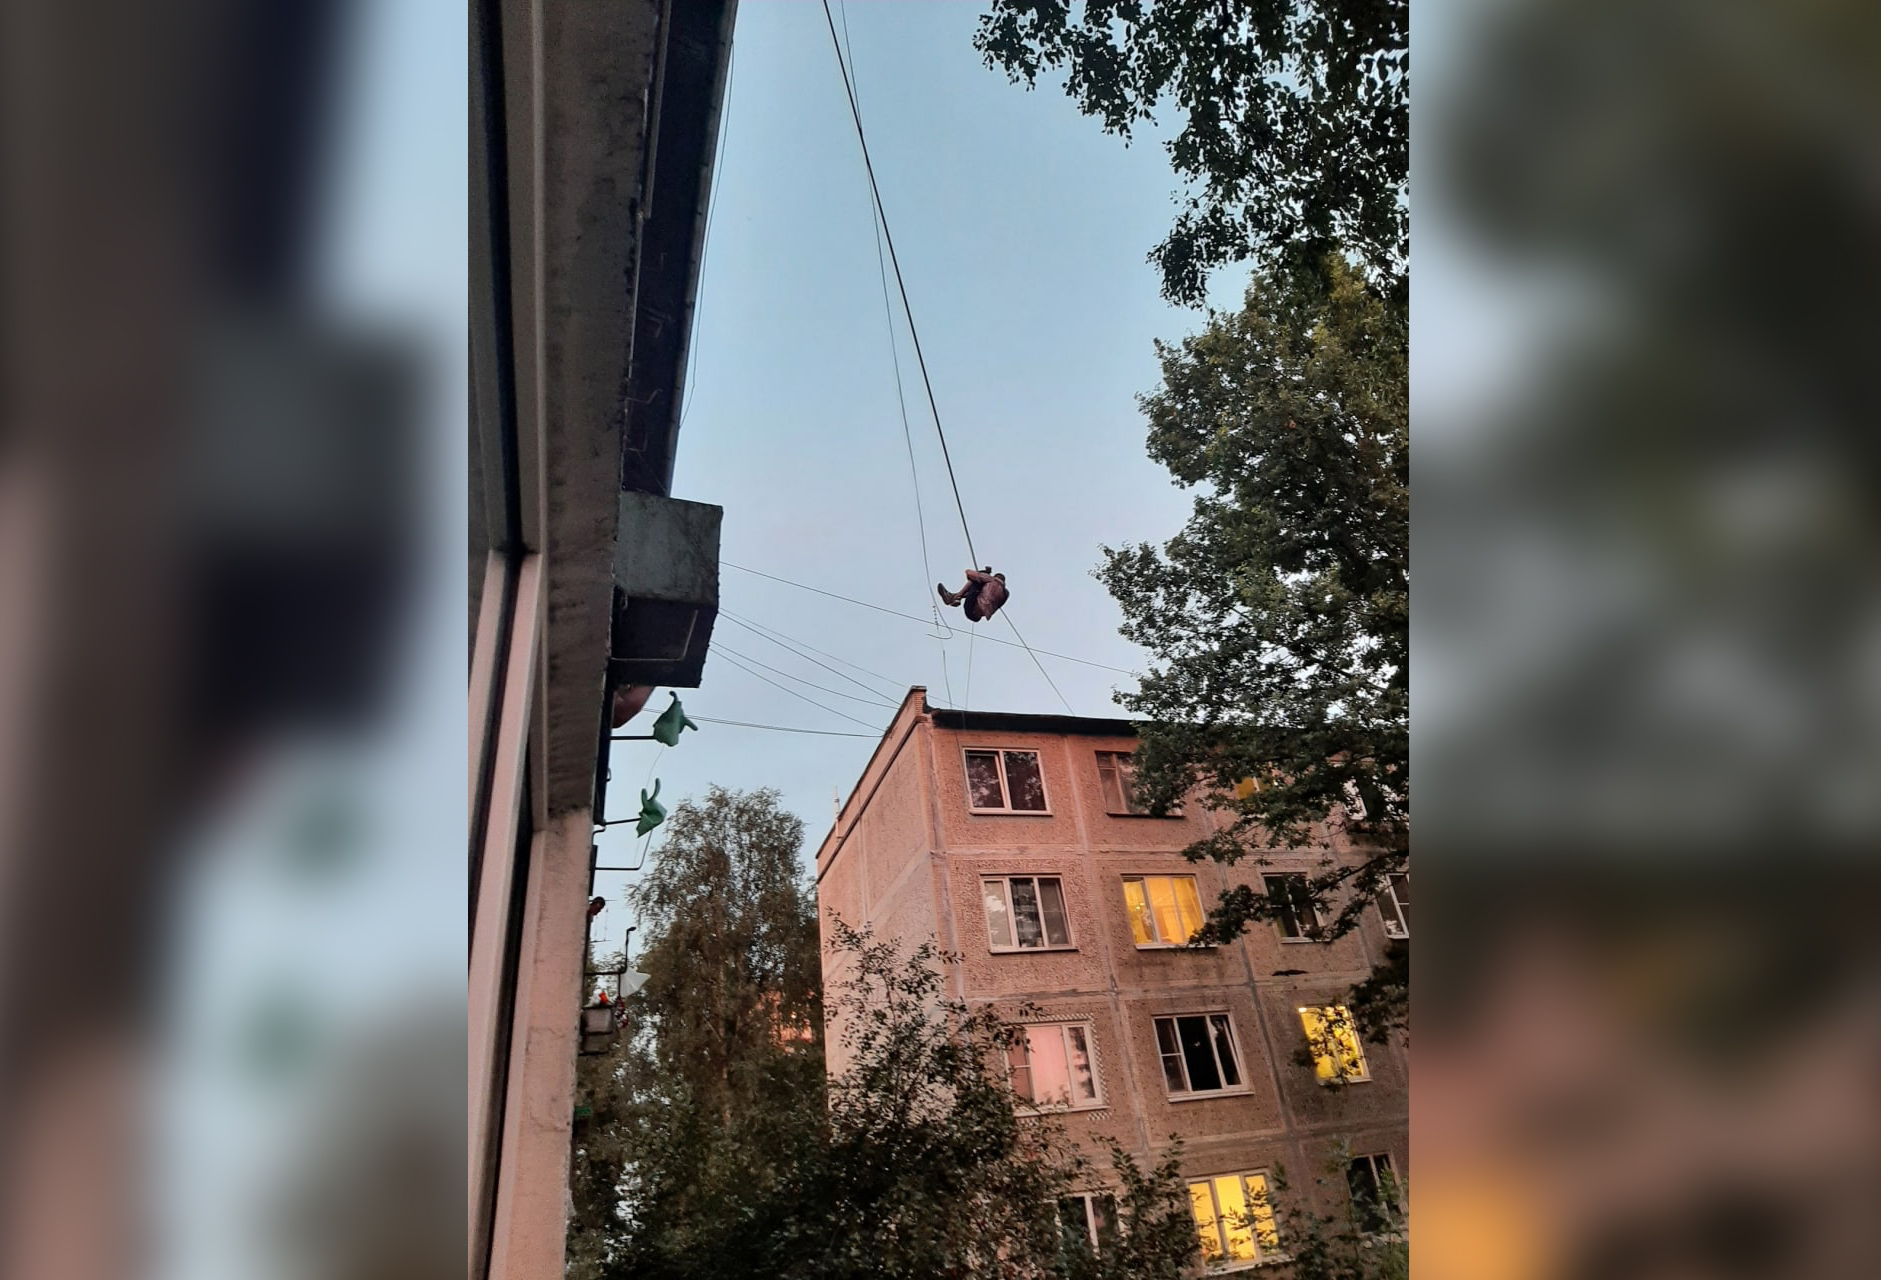 В Питере человек-паук под наркотиками завис на проводах